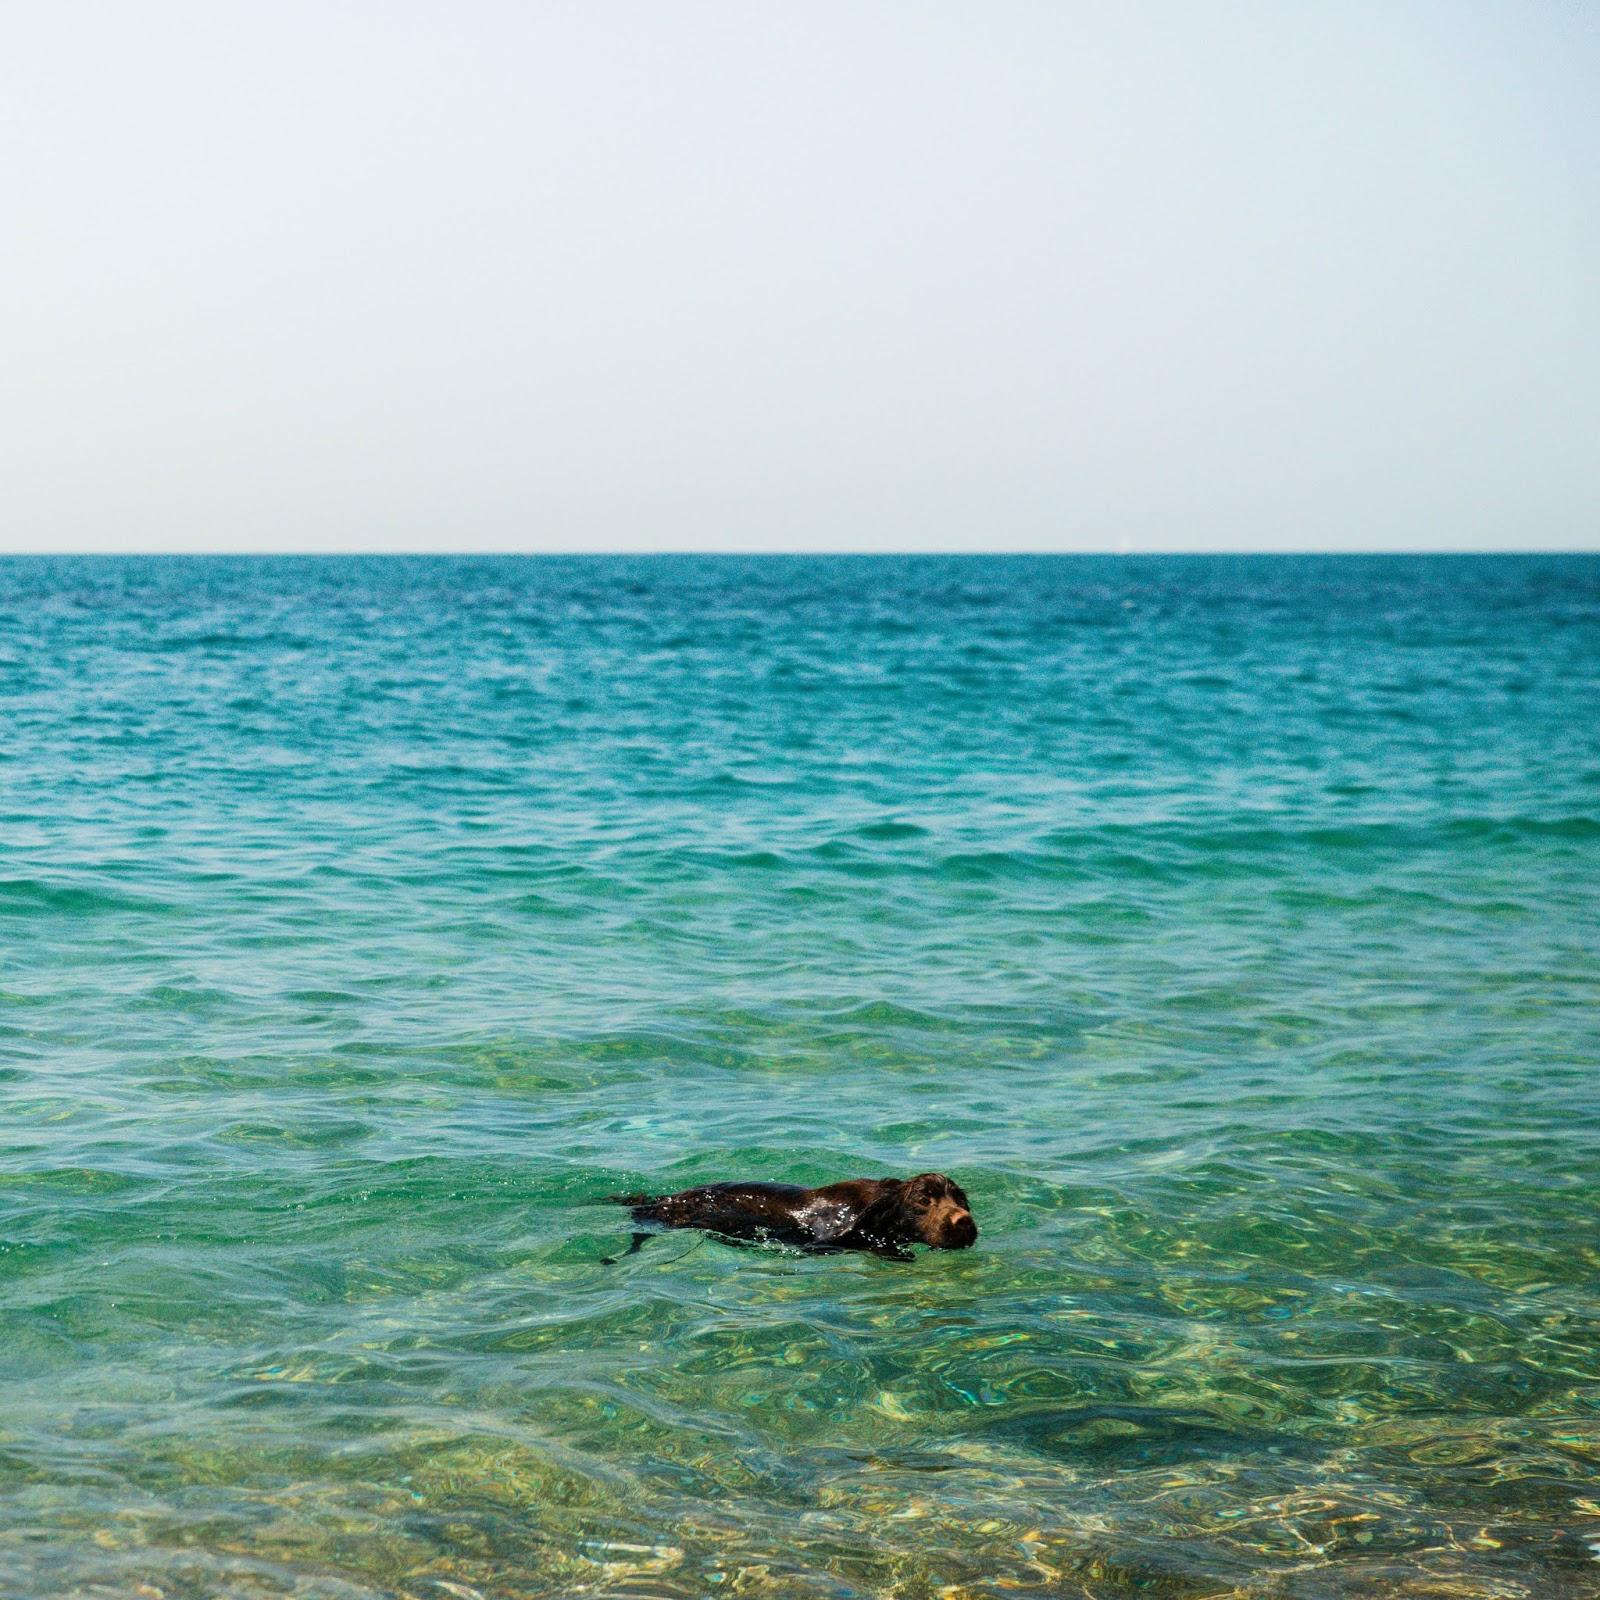 durdle door guide dog friendly liquid grain liquidgrain review